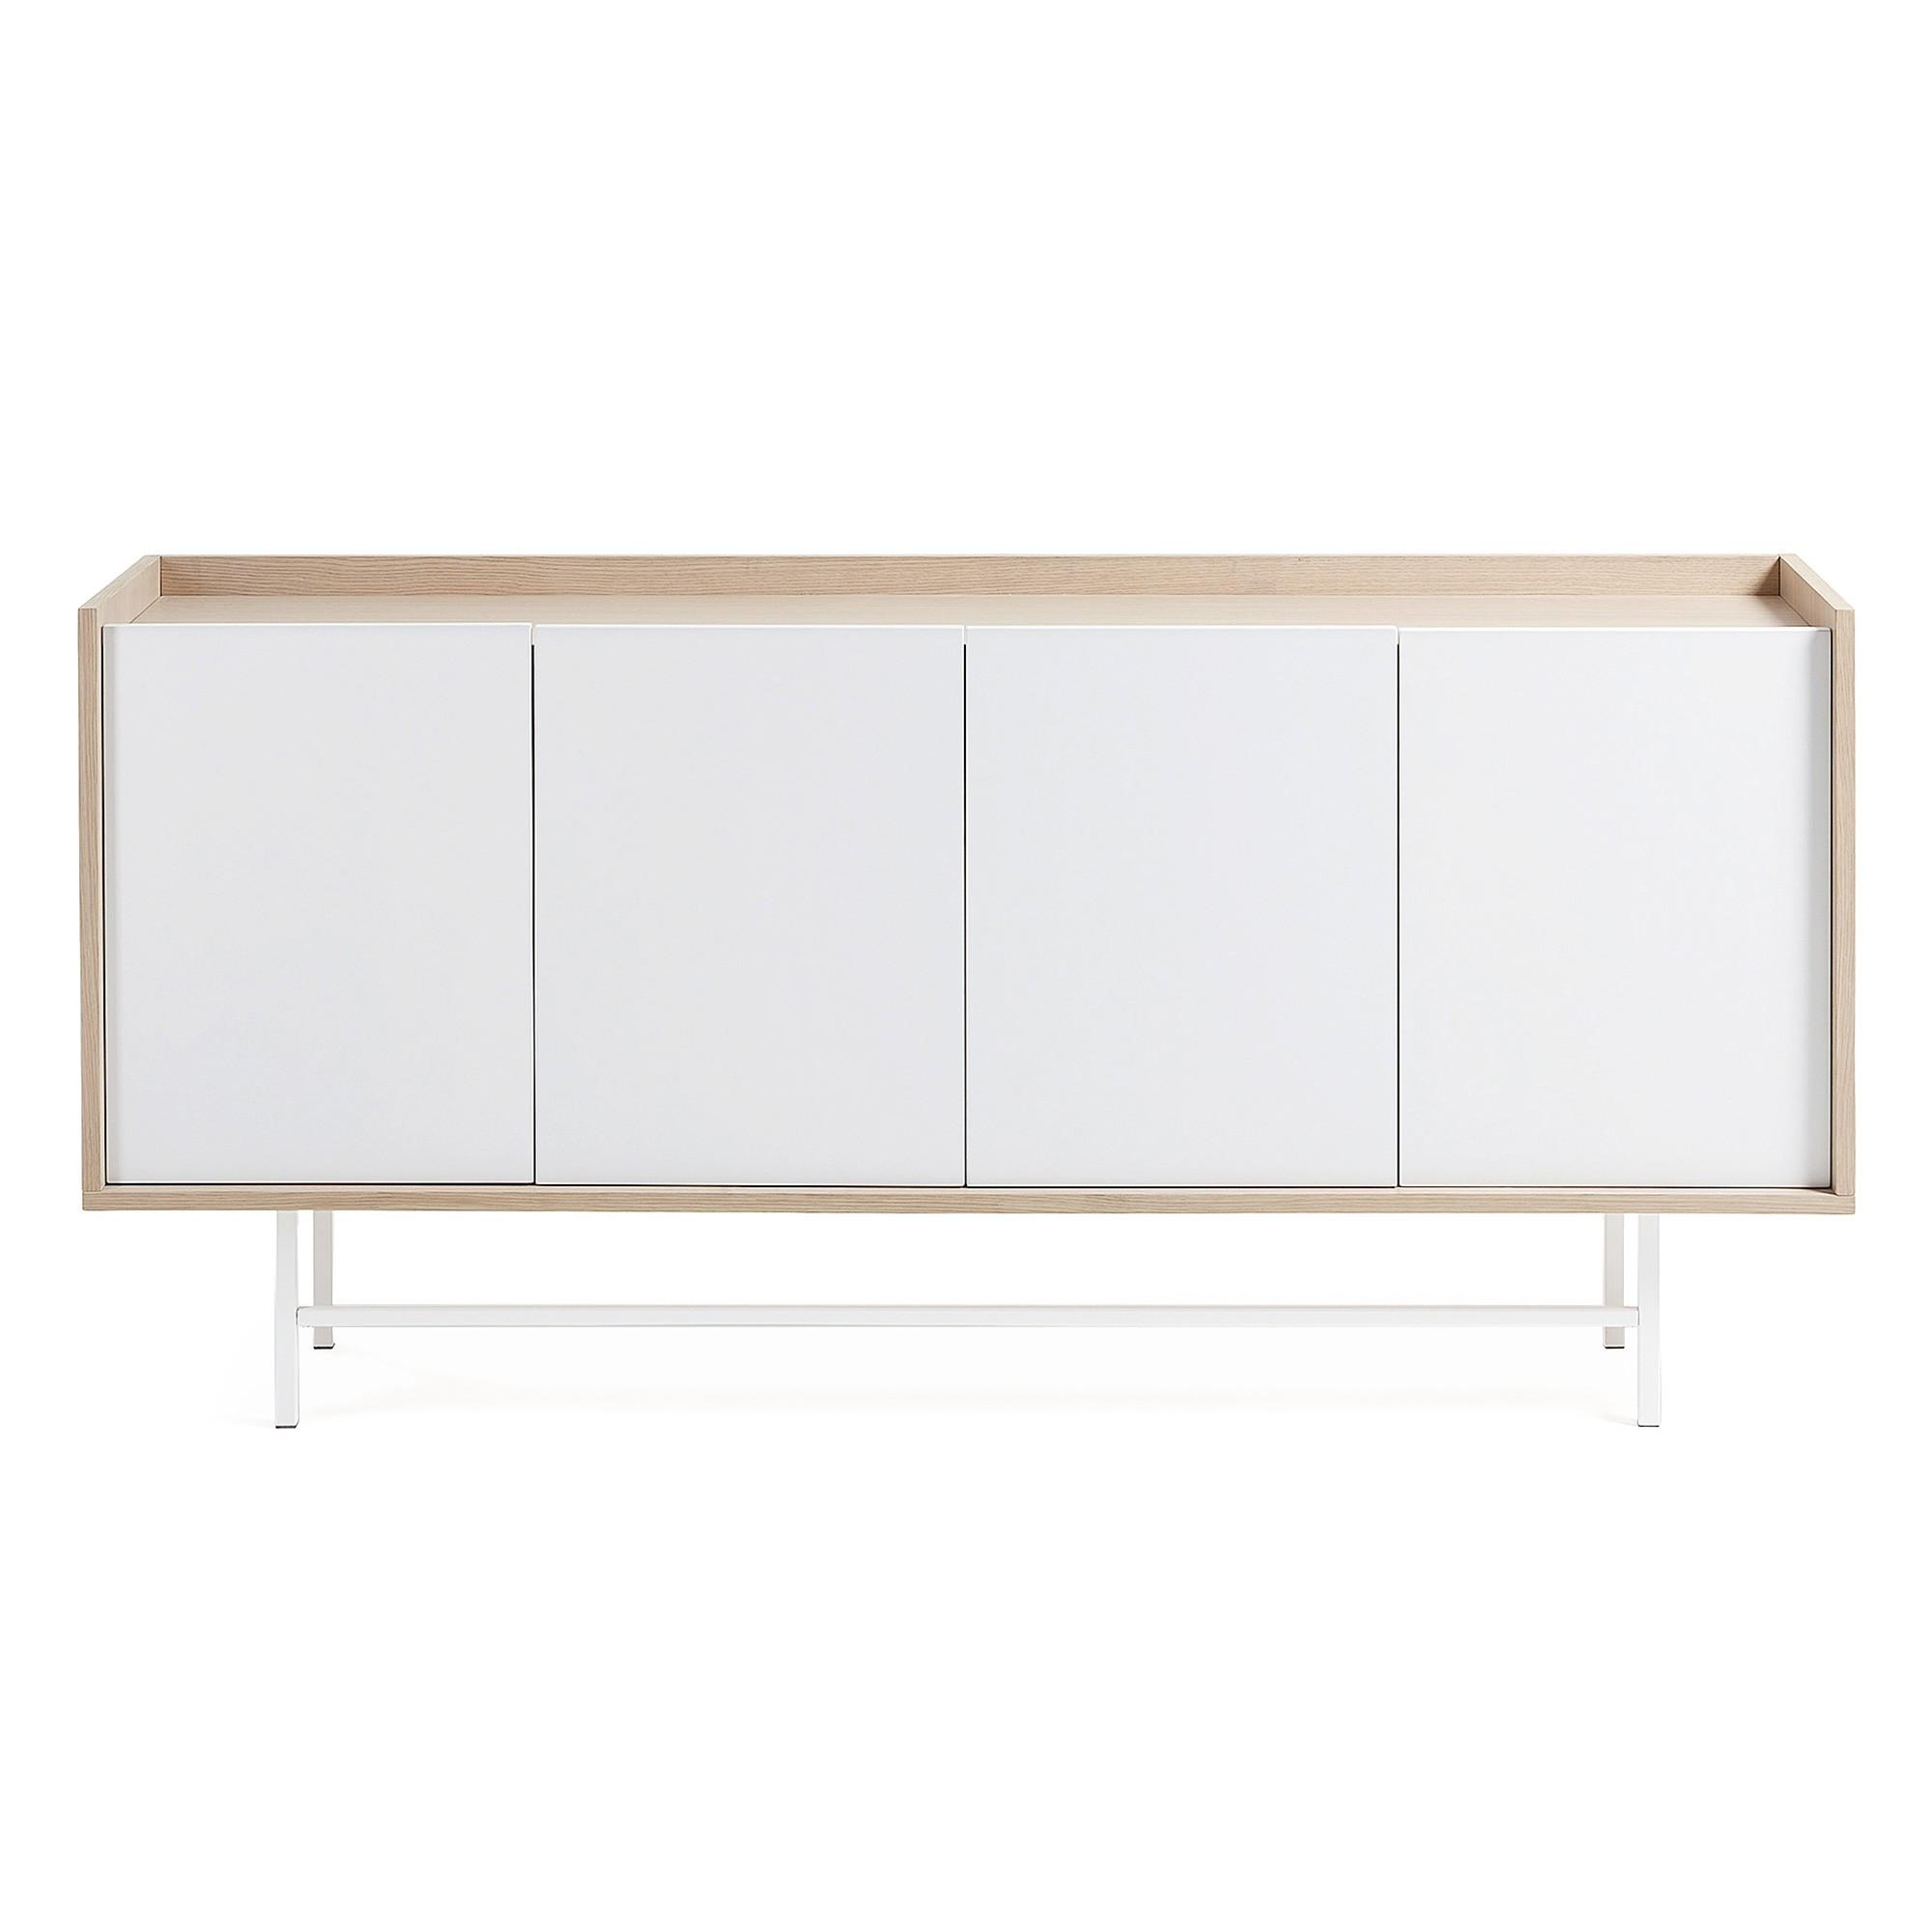 Buxton 4 Door Sideboard, 170cm